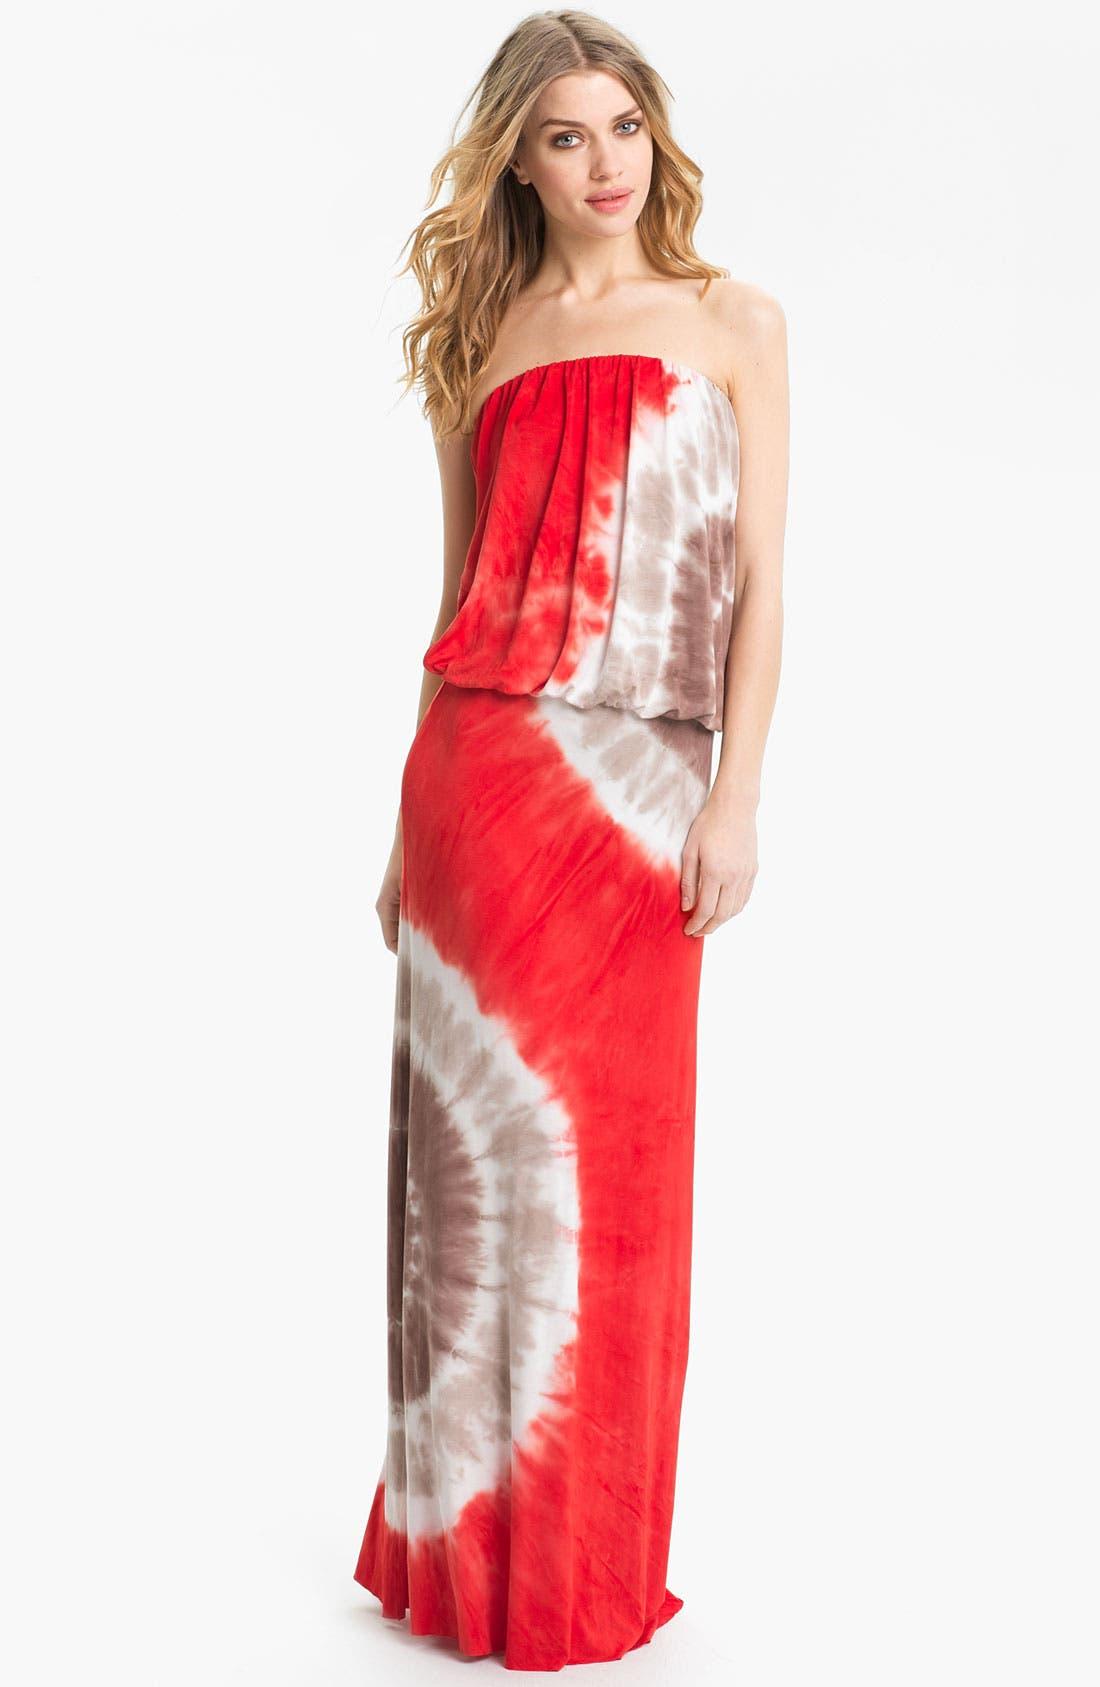 Main Image - Young, Fabulous & Broke 'Sydney' Strapless Maxi Dress